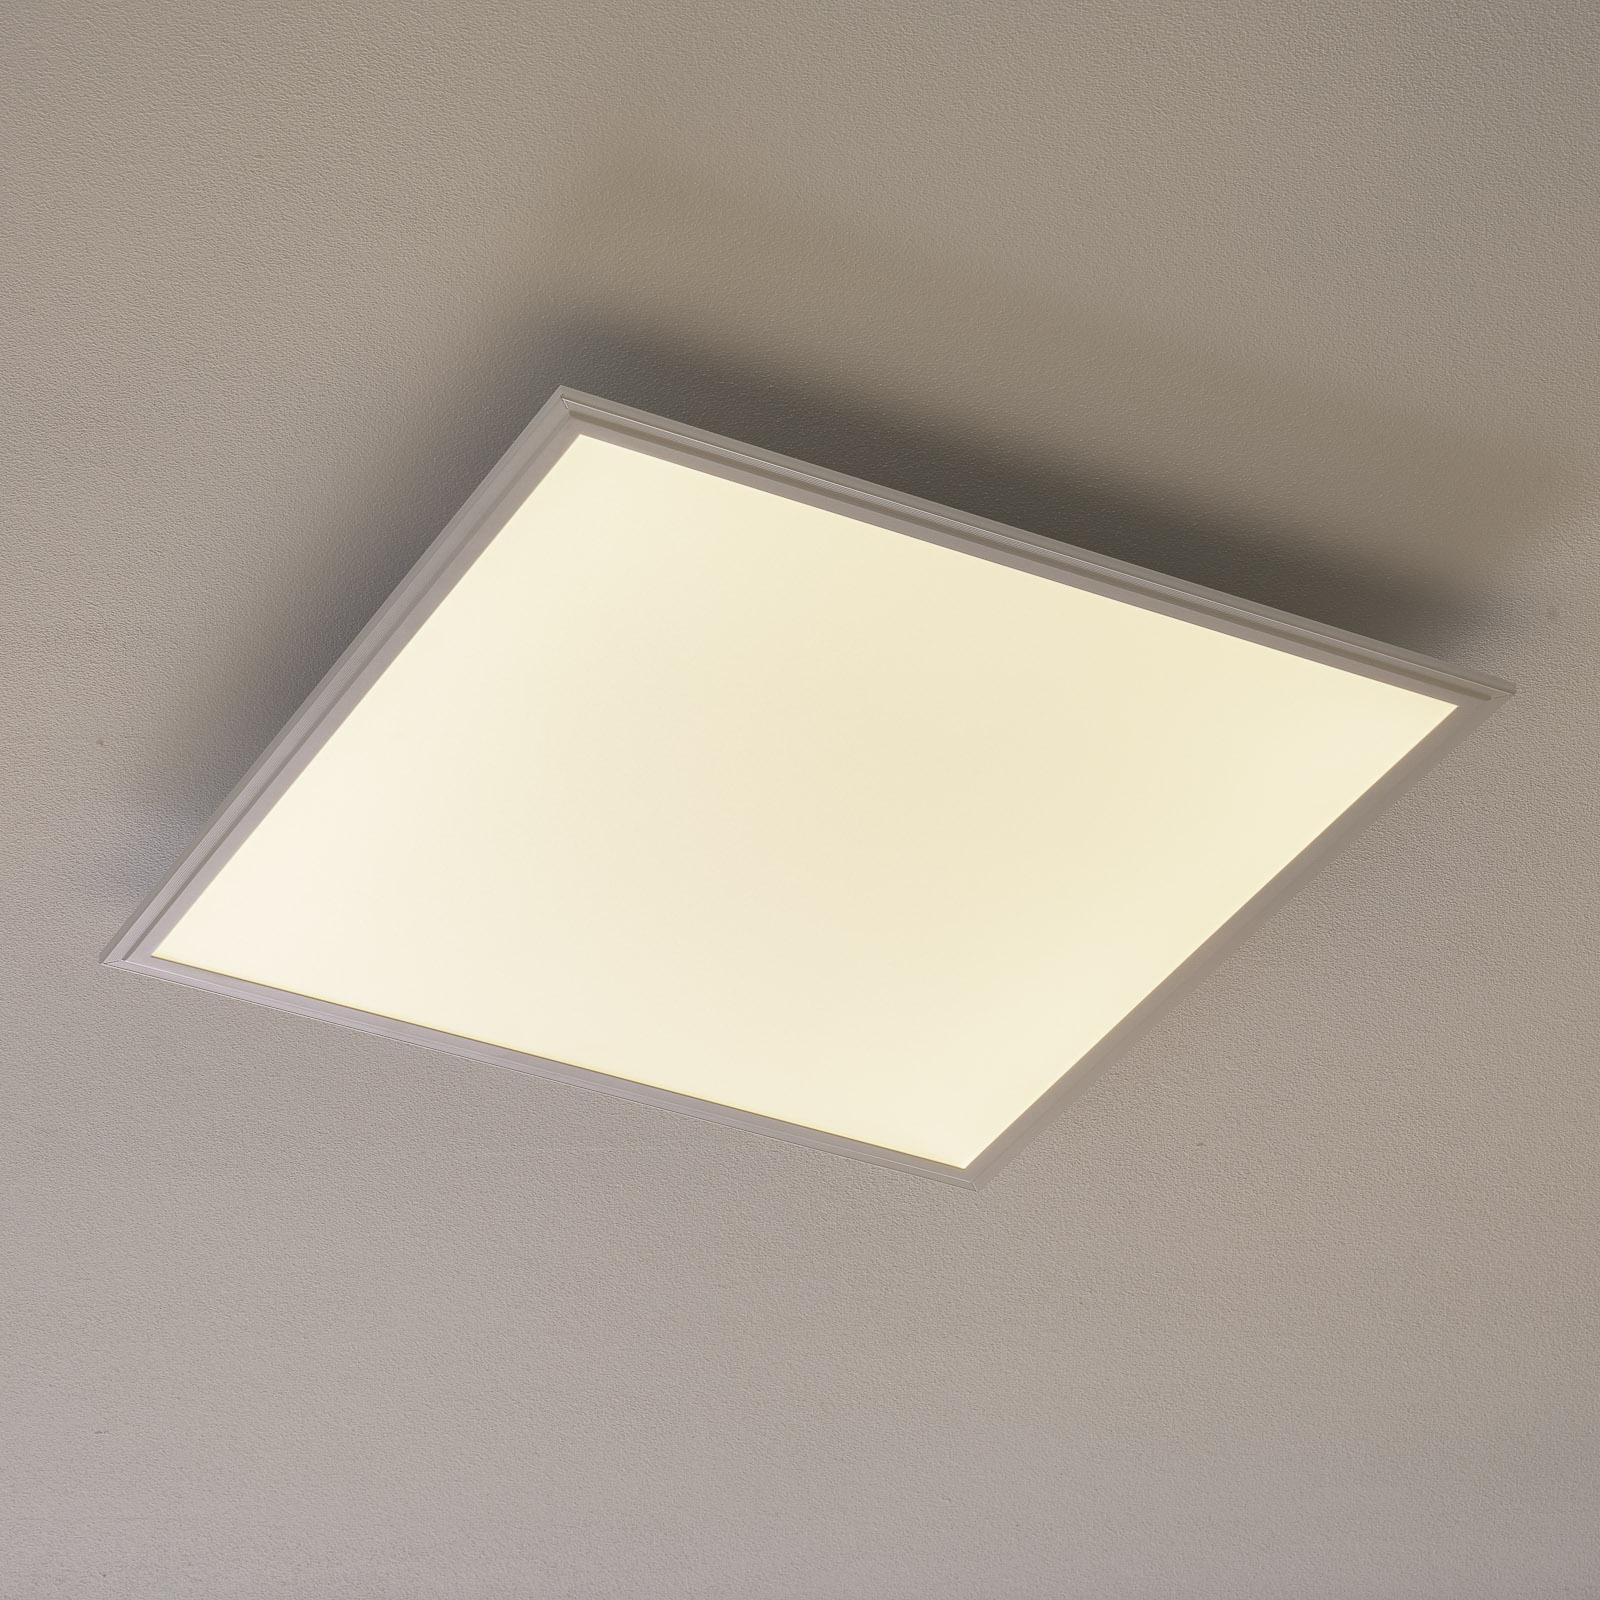 EGLO connect Salobrena-C LED-Panel weiß 59x59cm